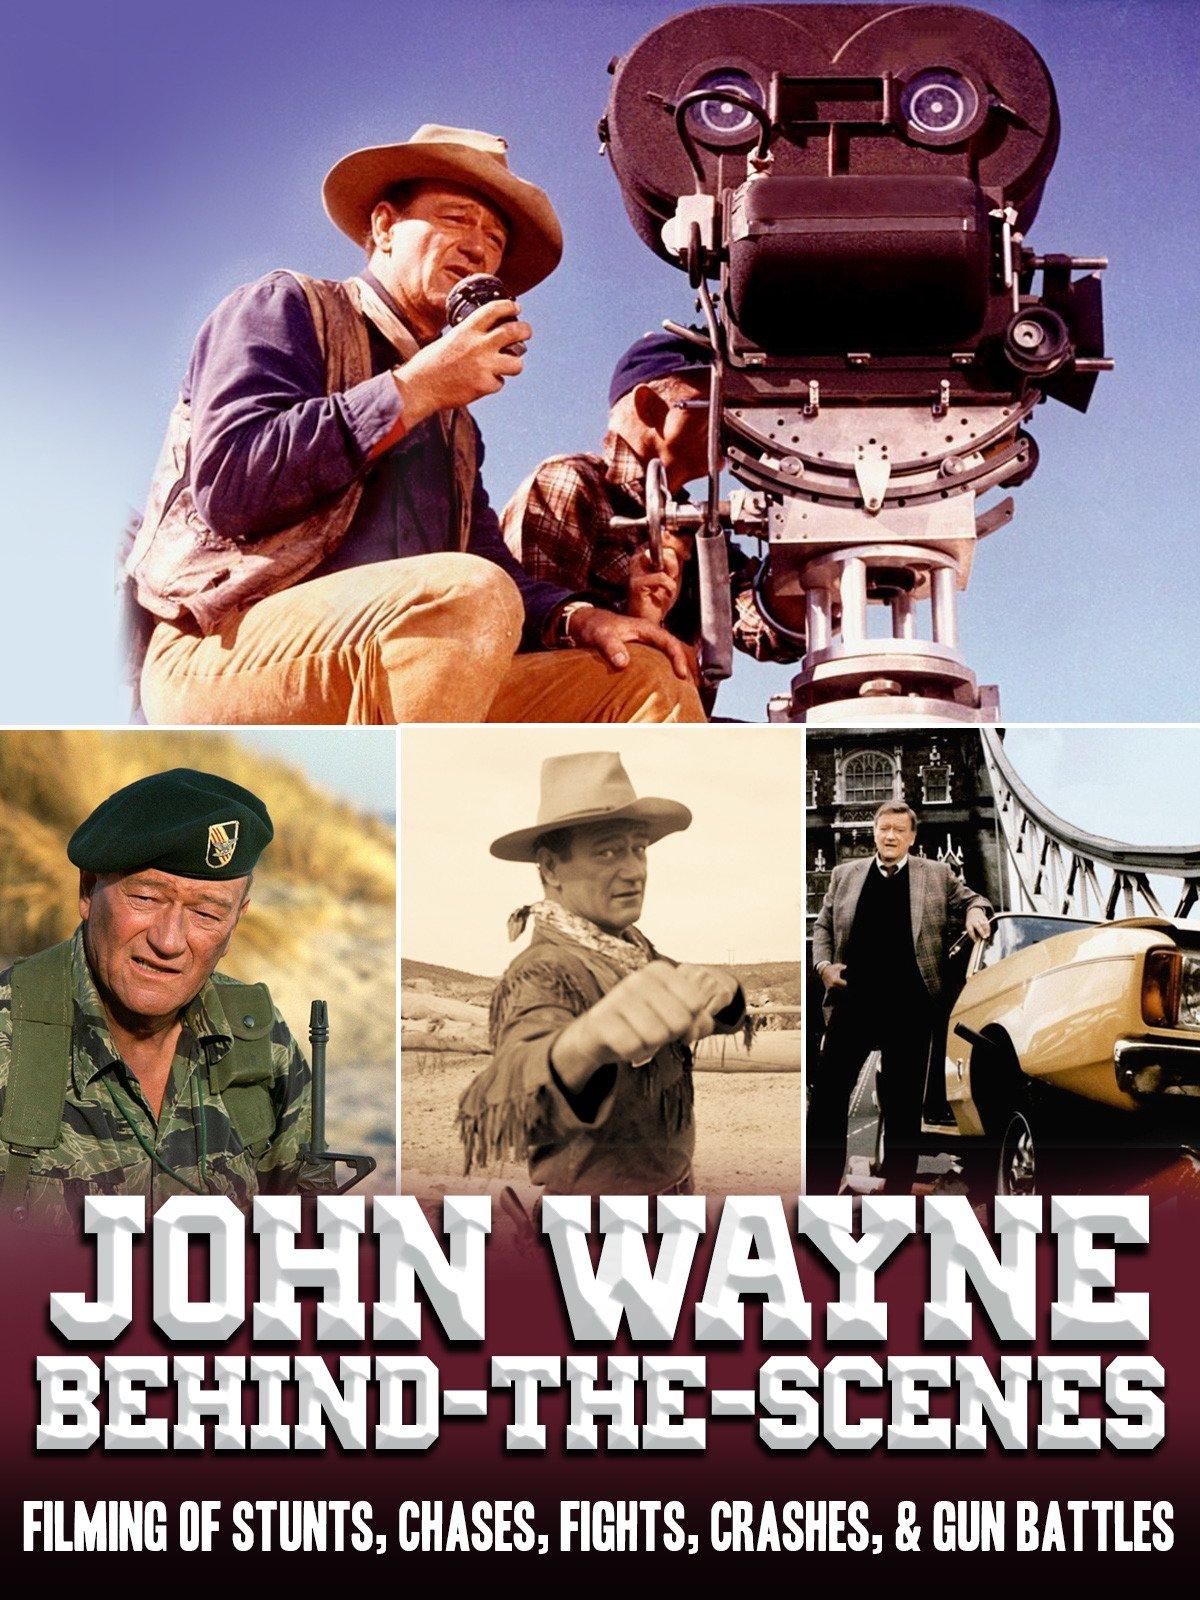 John Wayne Behind-the-Scenes - Filming Of Stunts, Chases, Fights, Crashes, Gun Battles